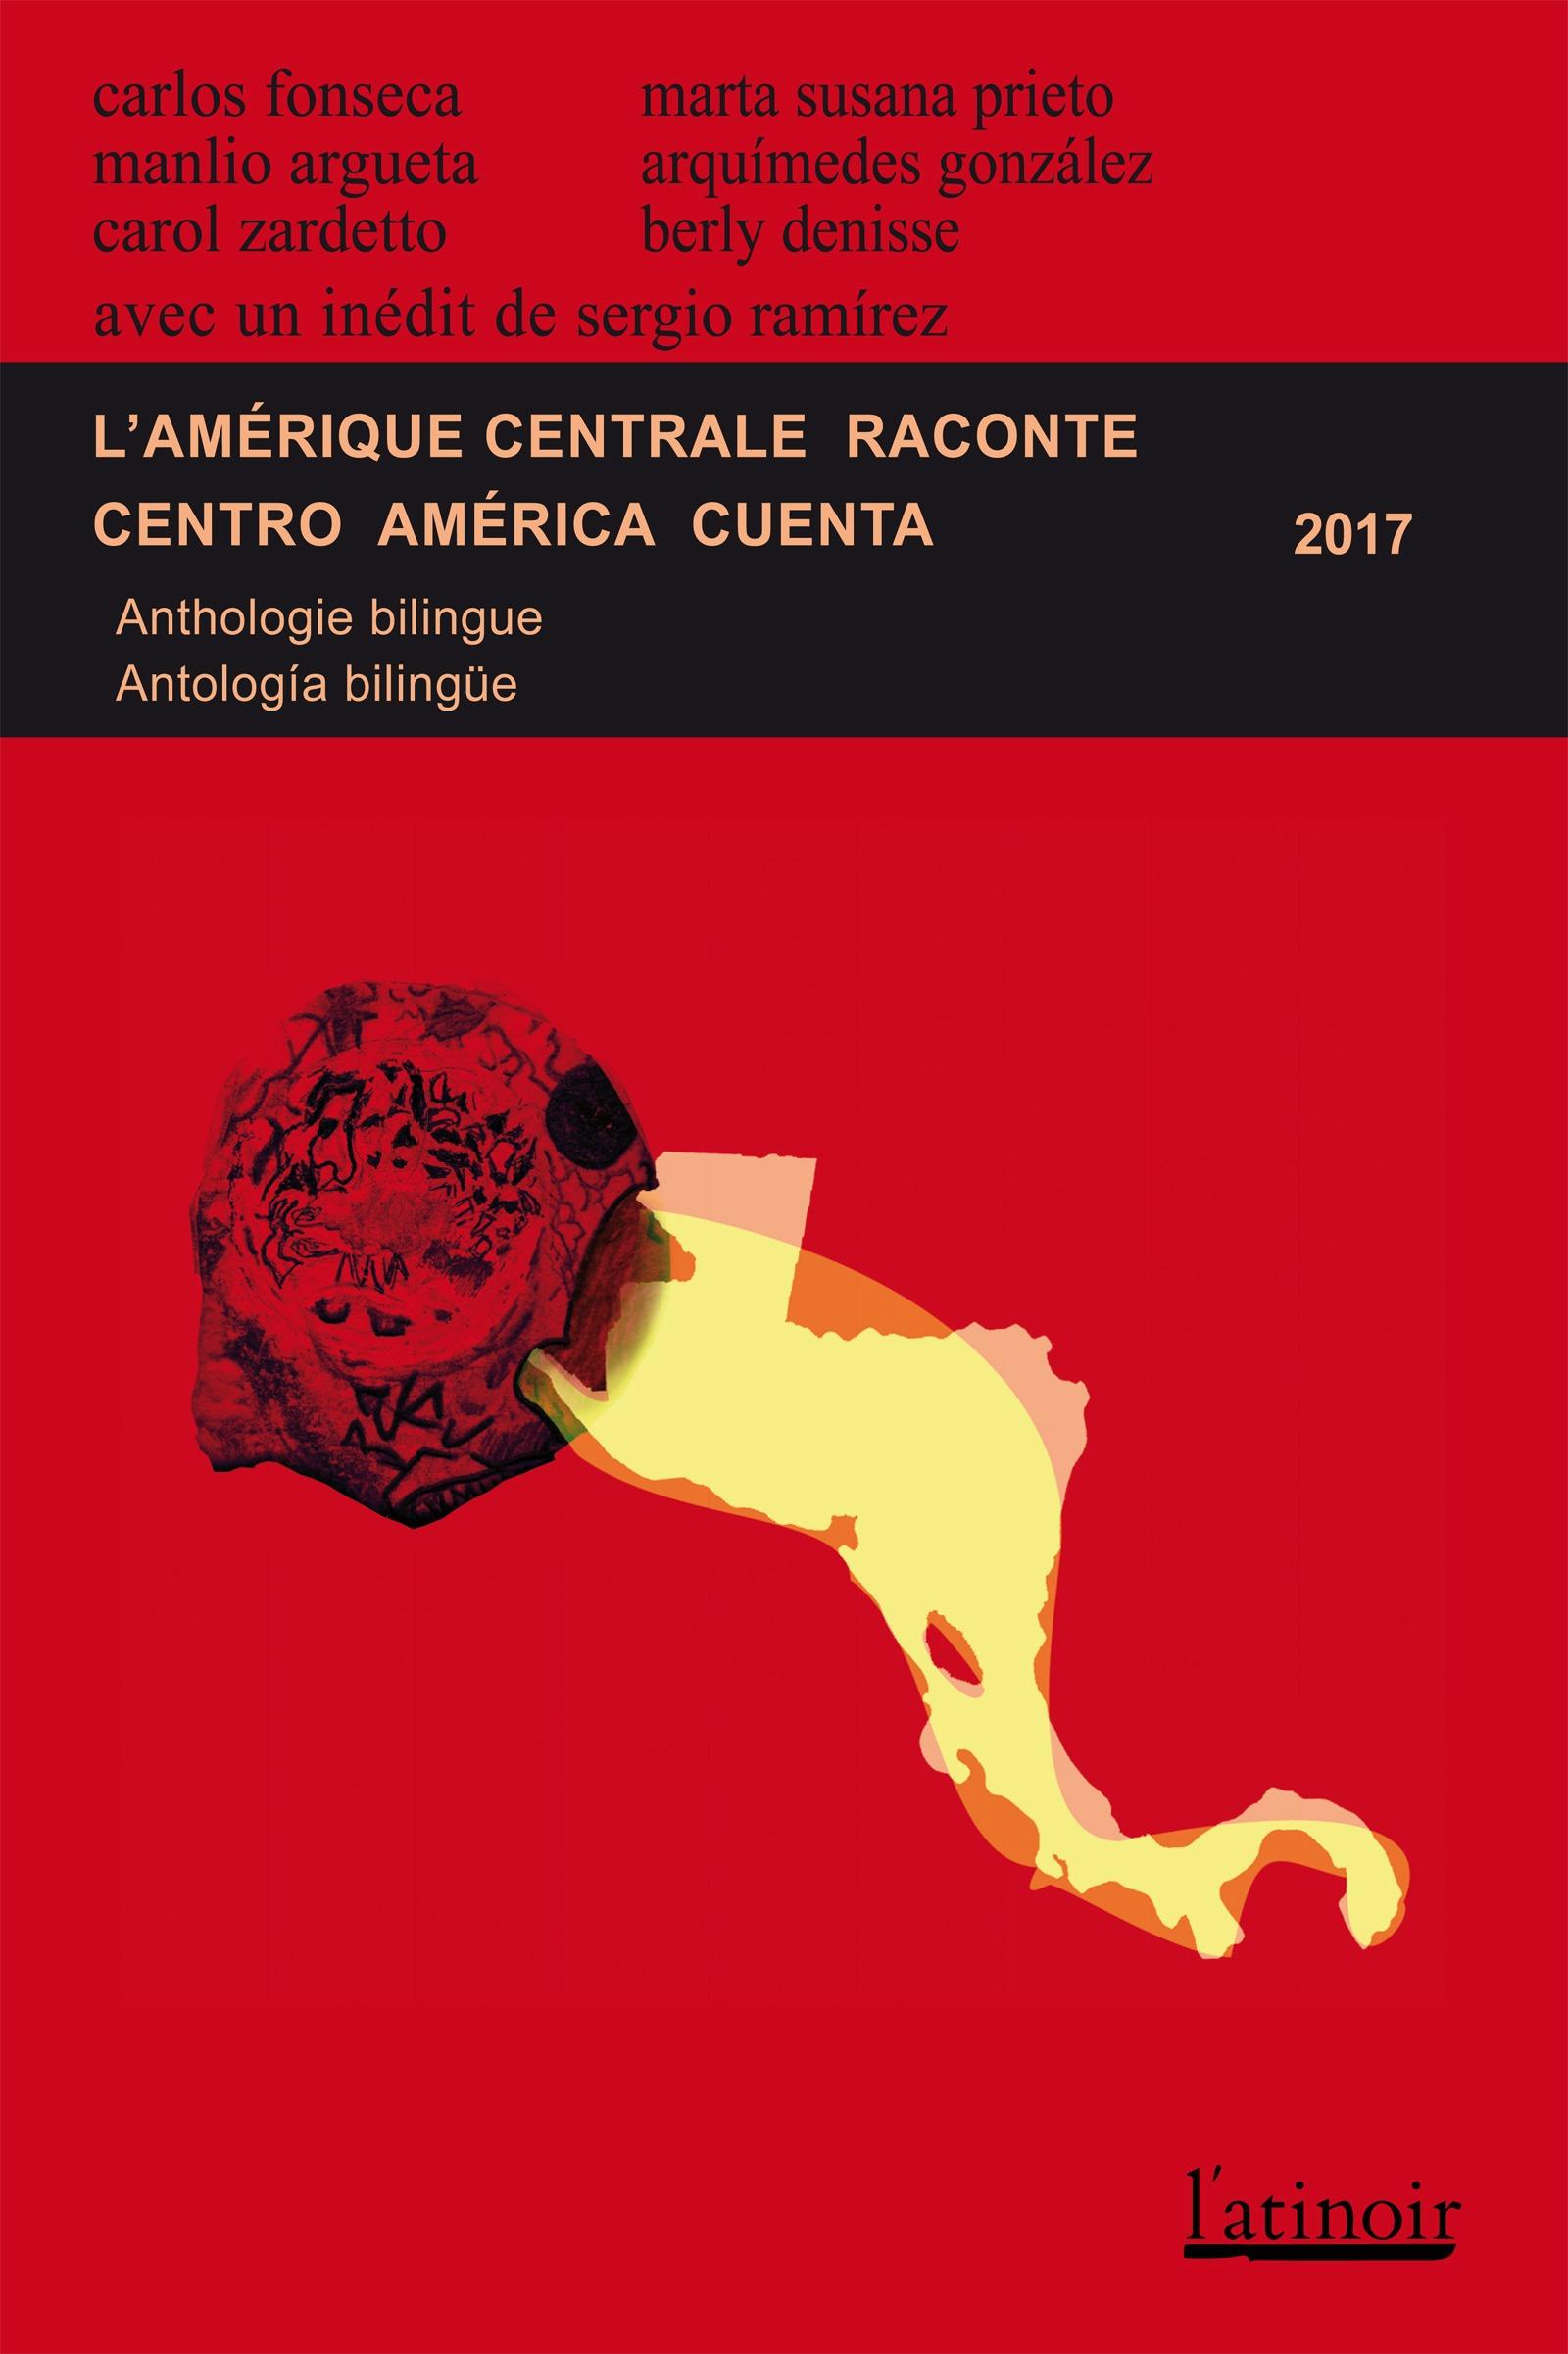 L'Amérique centrale raconte - Centro América cuenta 2017 (Édition bilingue/edición bilingüe)